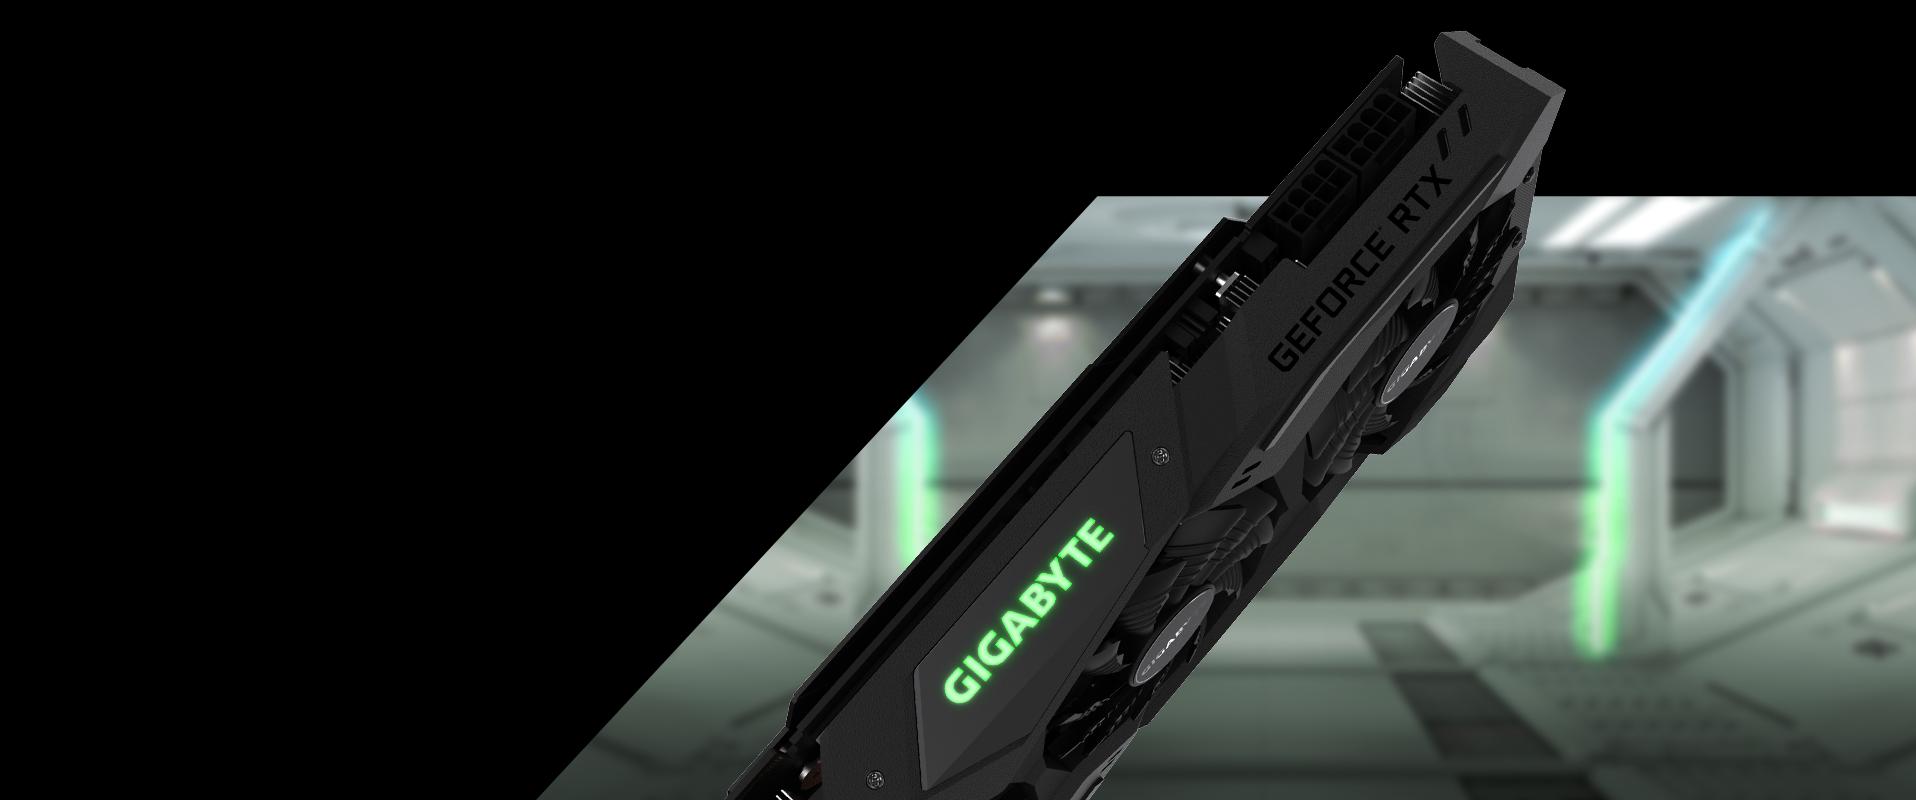 Gigabyte Geforce RTX 2080 Ti 11GB Windforce 10